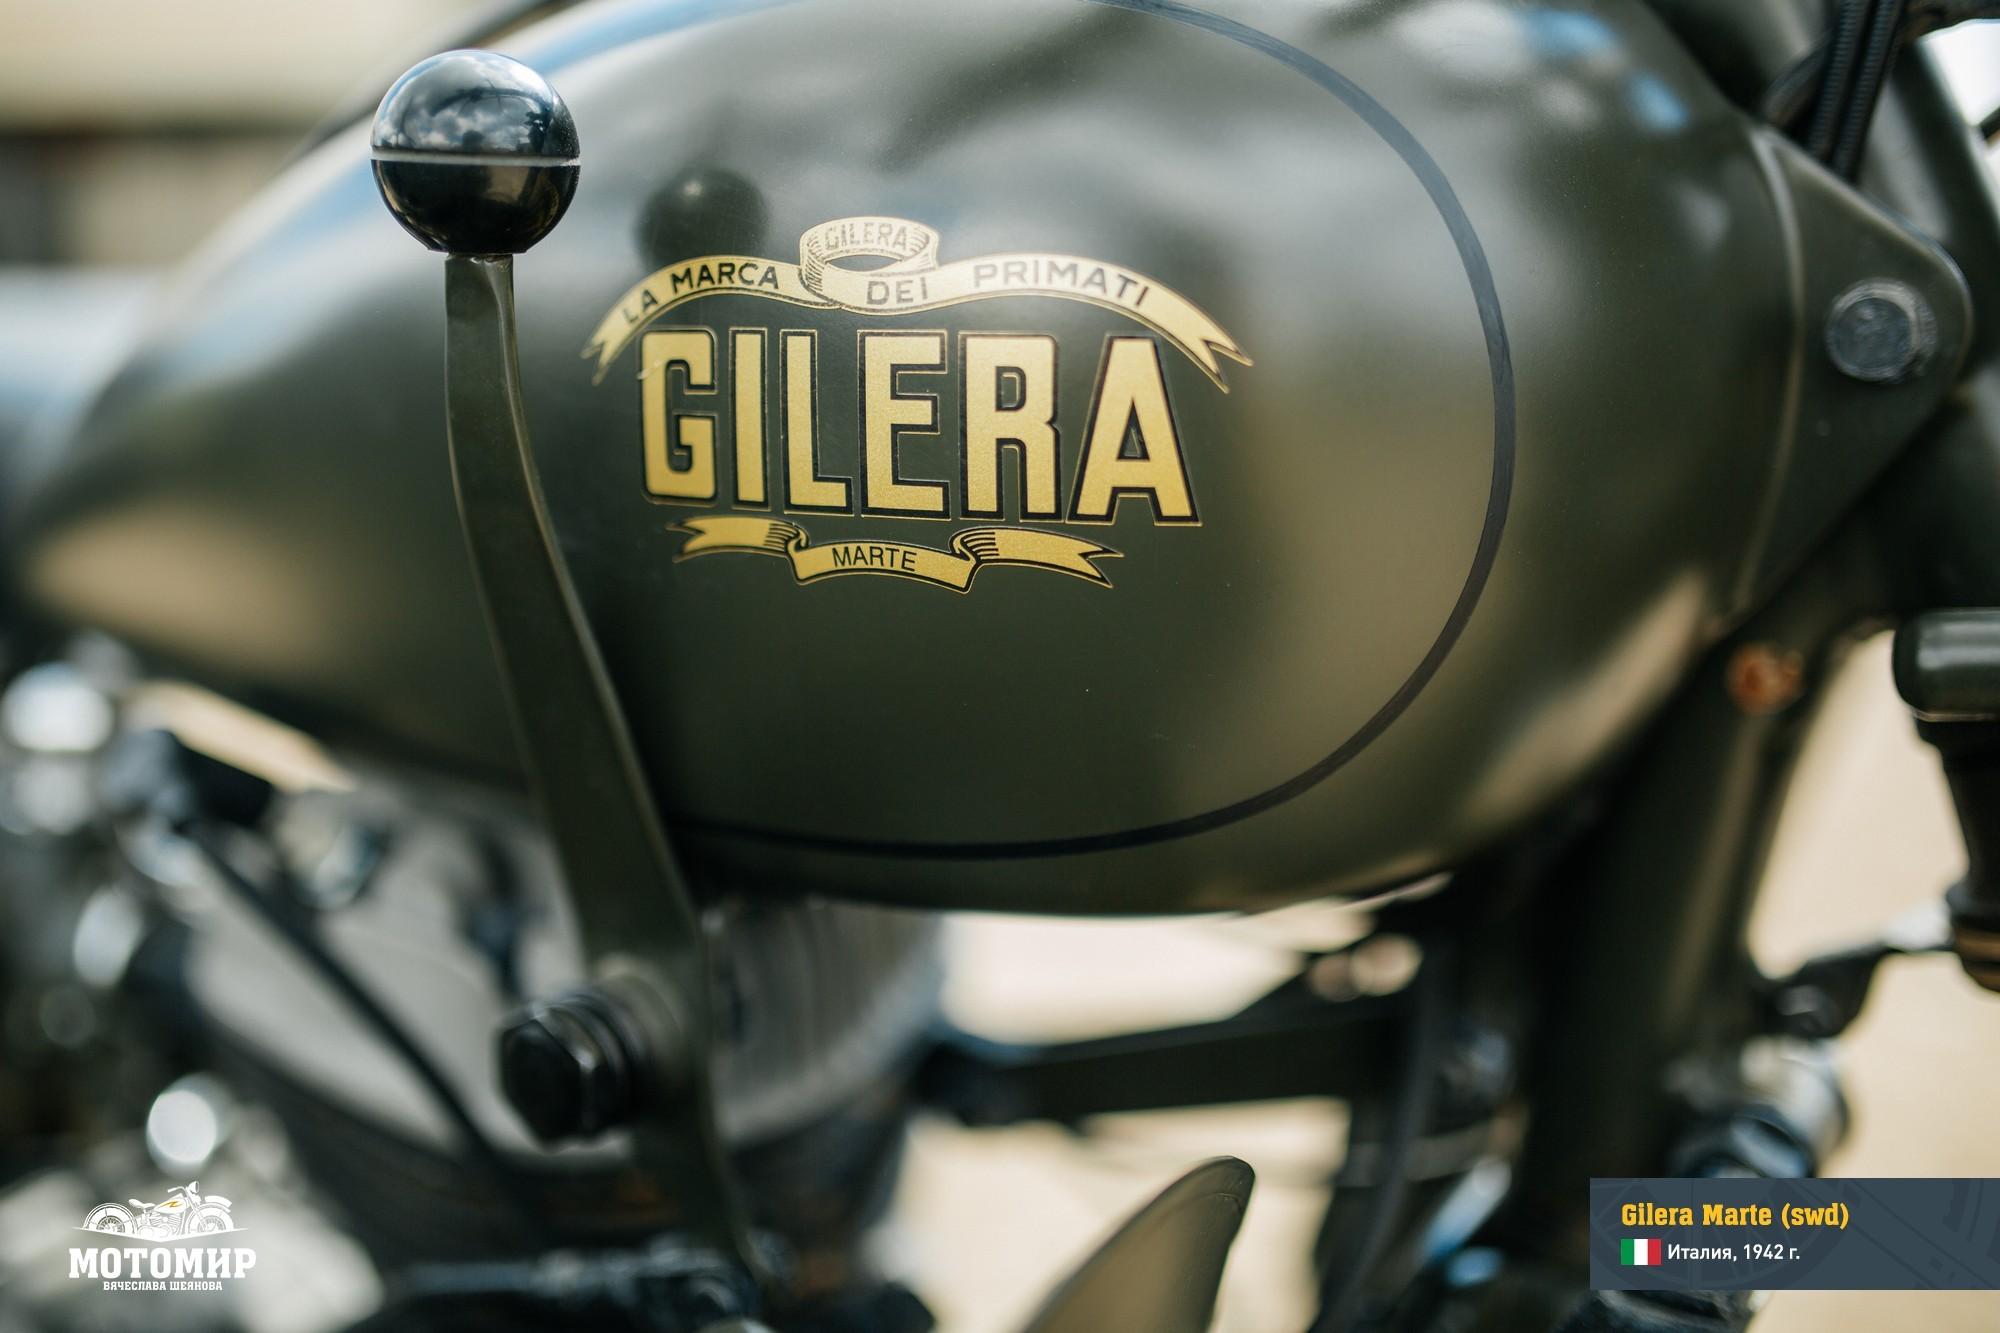 gilera-marte-swd-201510-web-33